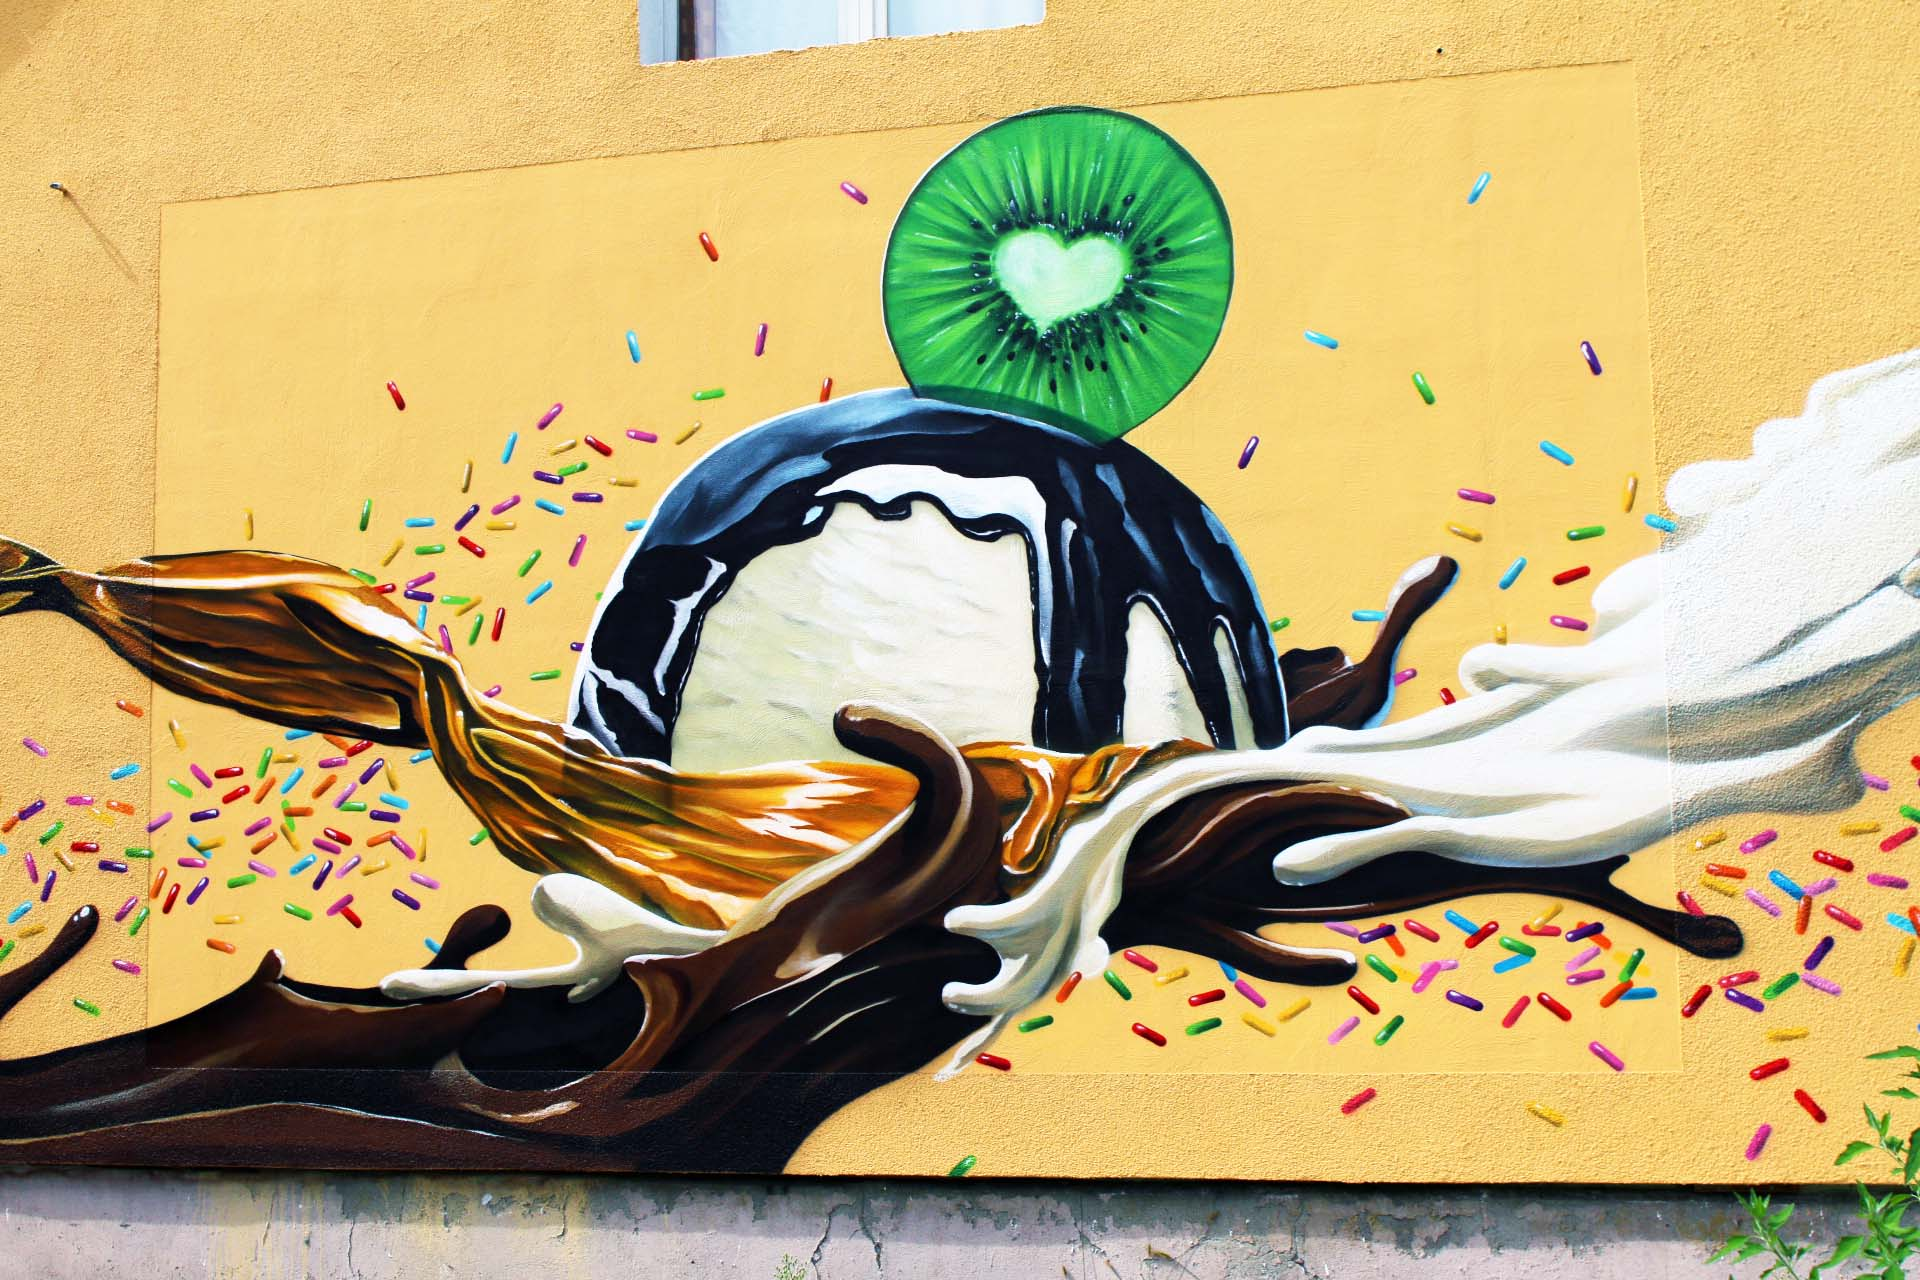 Aktuelle graffiti malerei graffiti k nstler und - Wandmalerei berlin ...